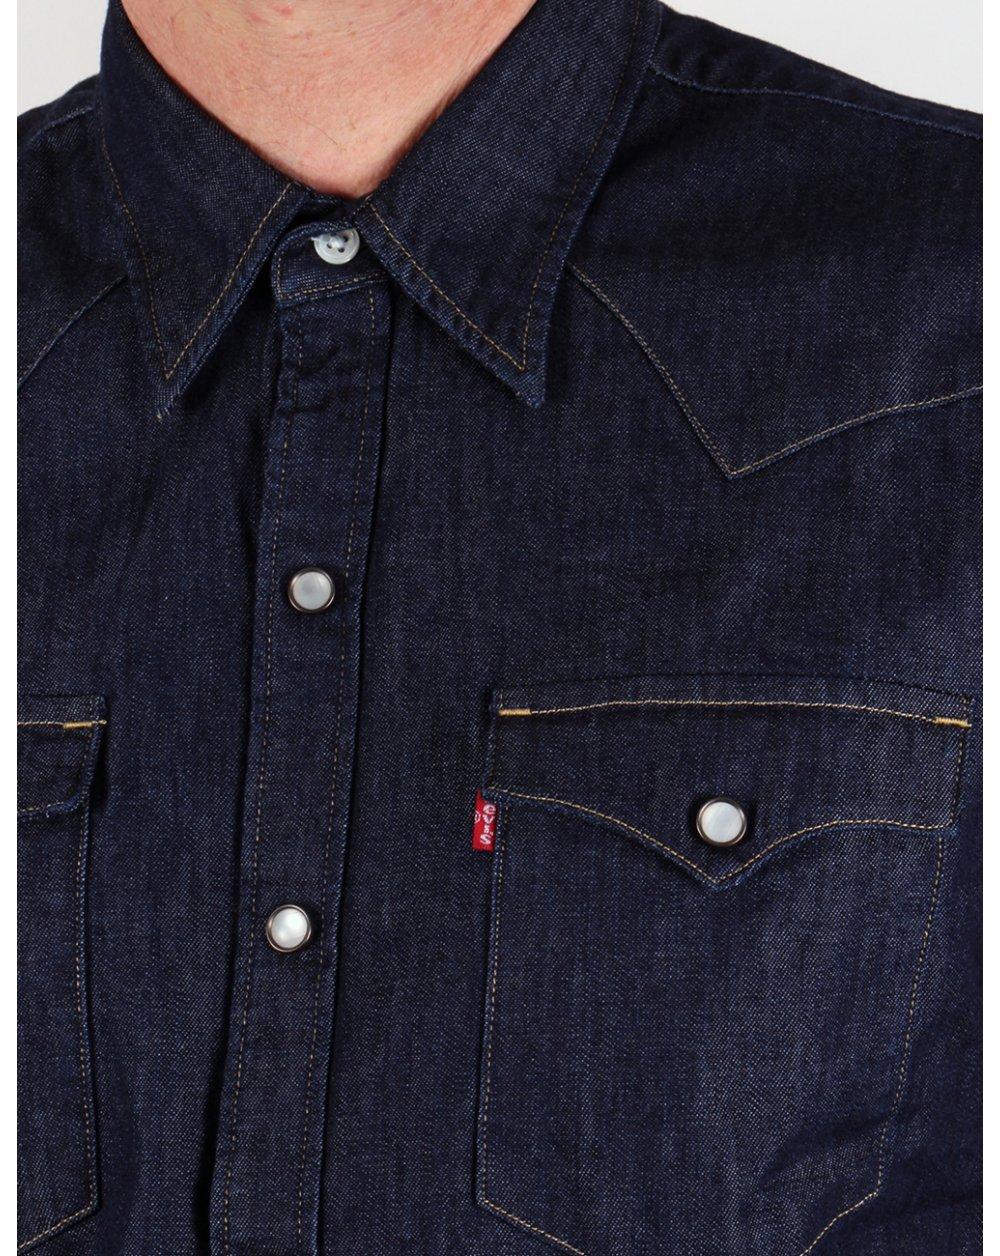 9a163616fb6 Levis Barstow Western Shirt Dark Denim